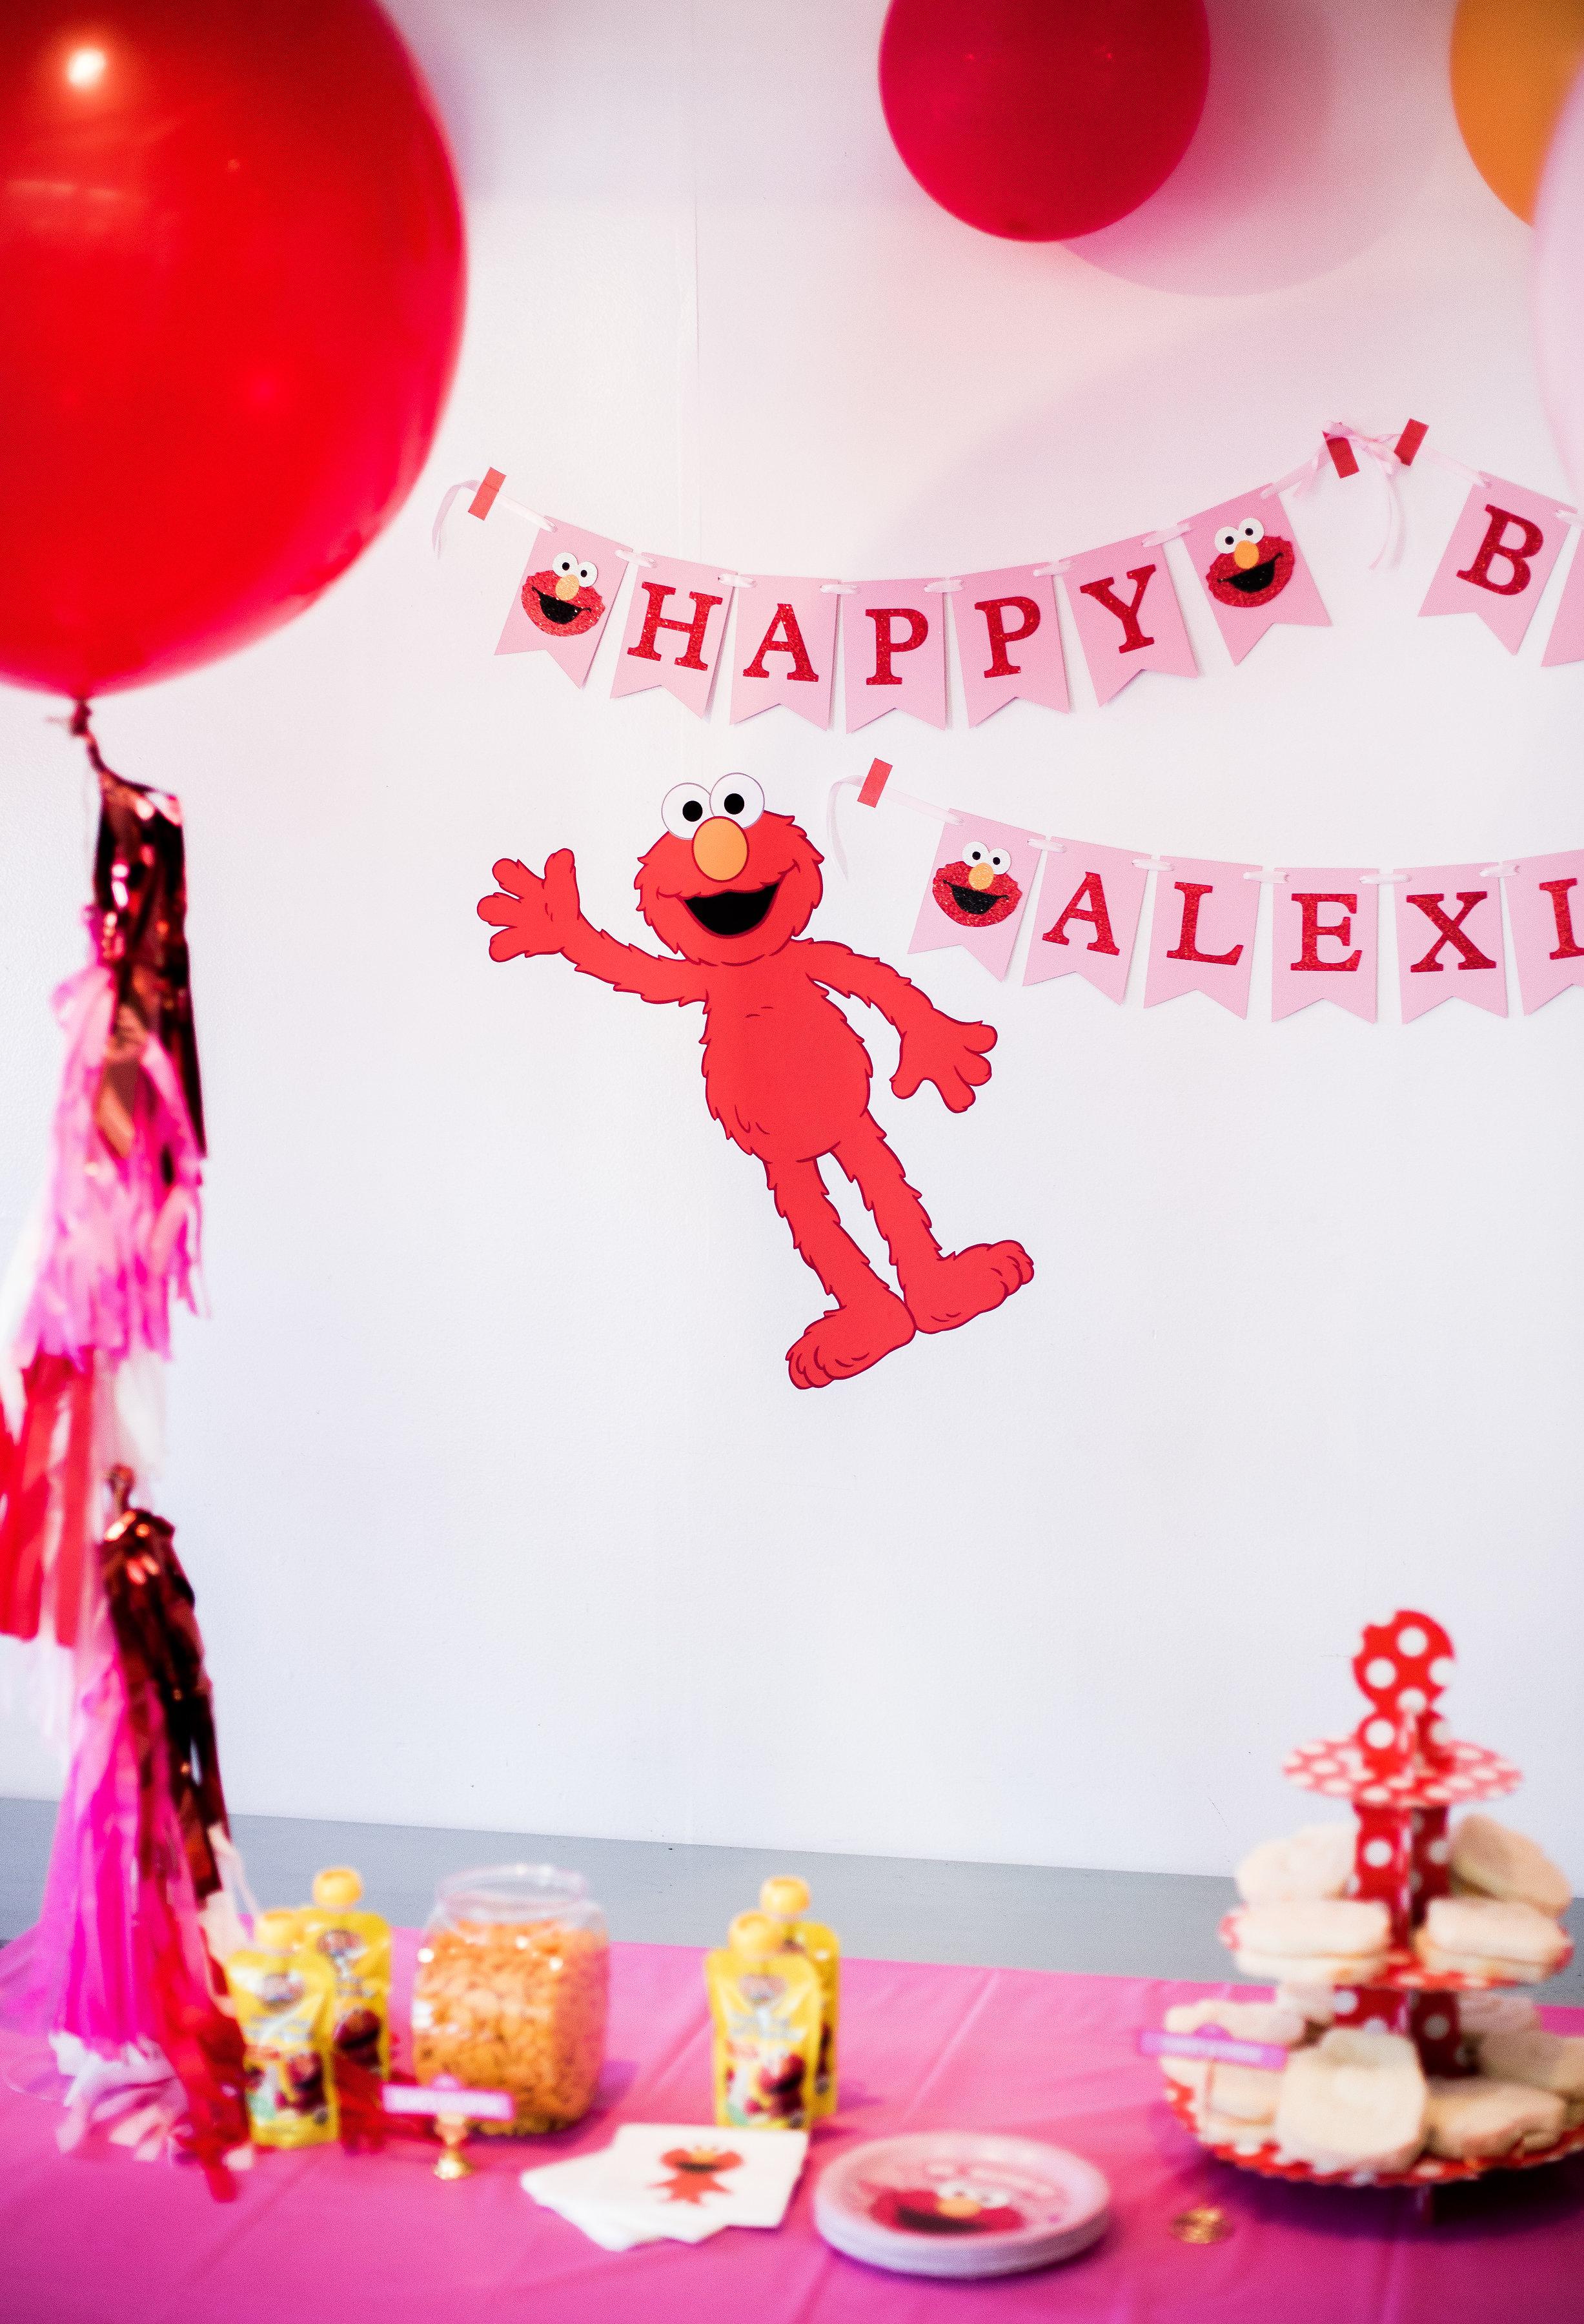 Alexis'_1st_Birthday_04.07.18_-130.jpg